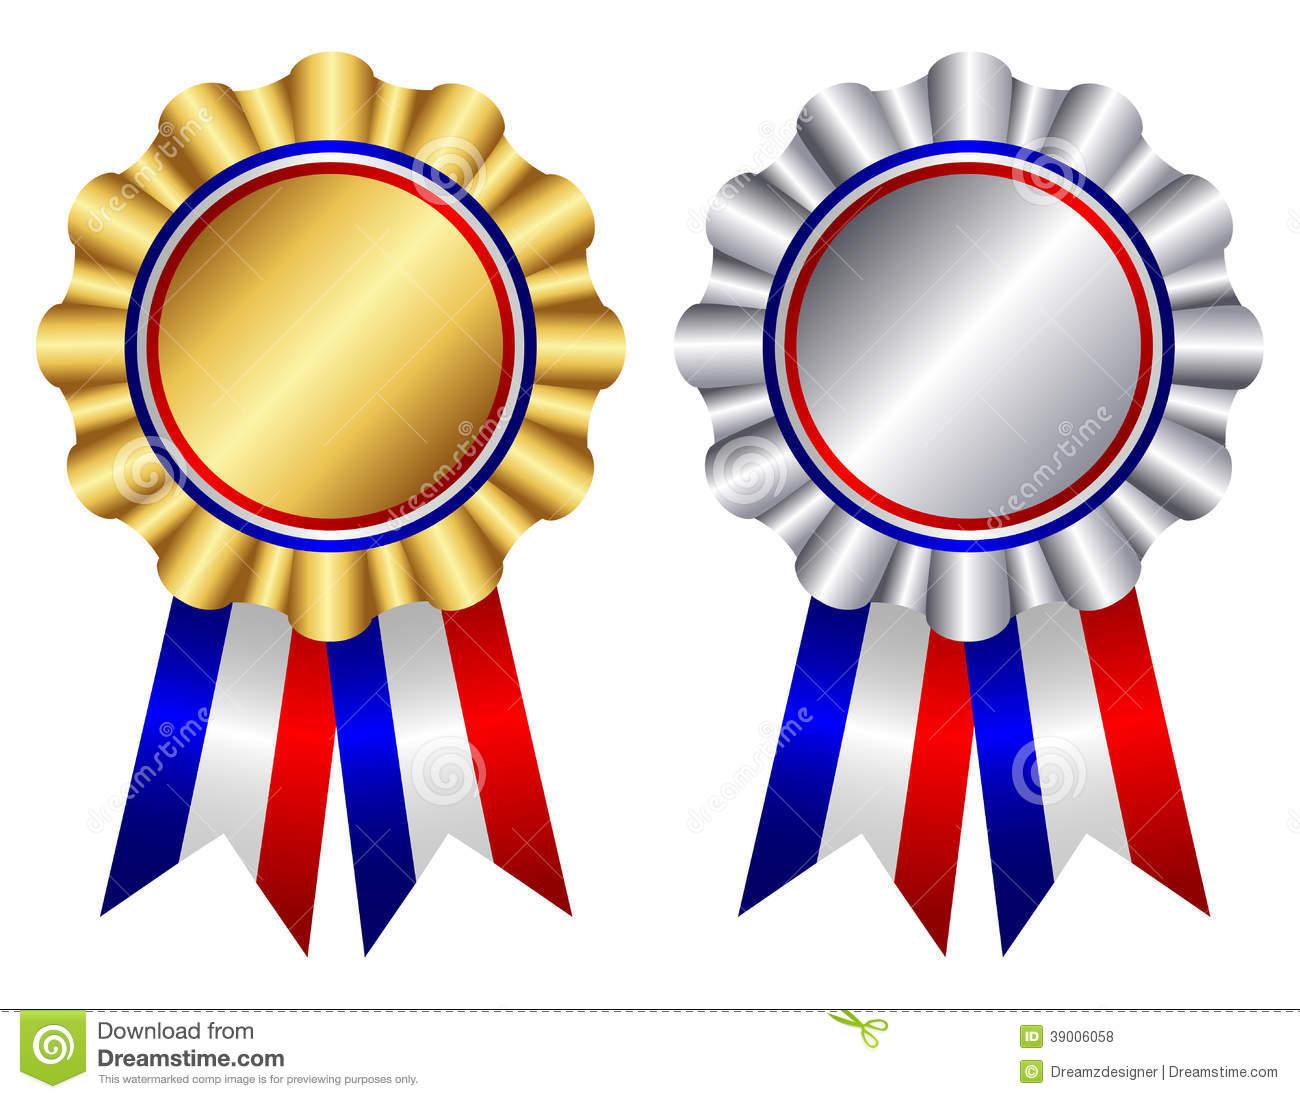 Ribbons for kadil carpentersdaughter. Awards clipart printable